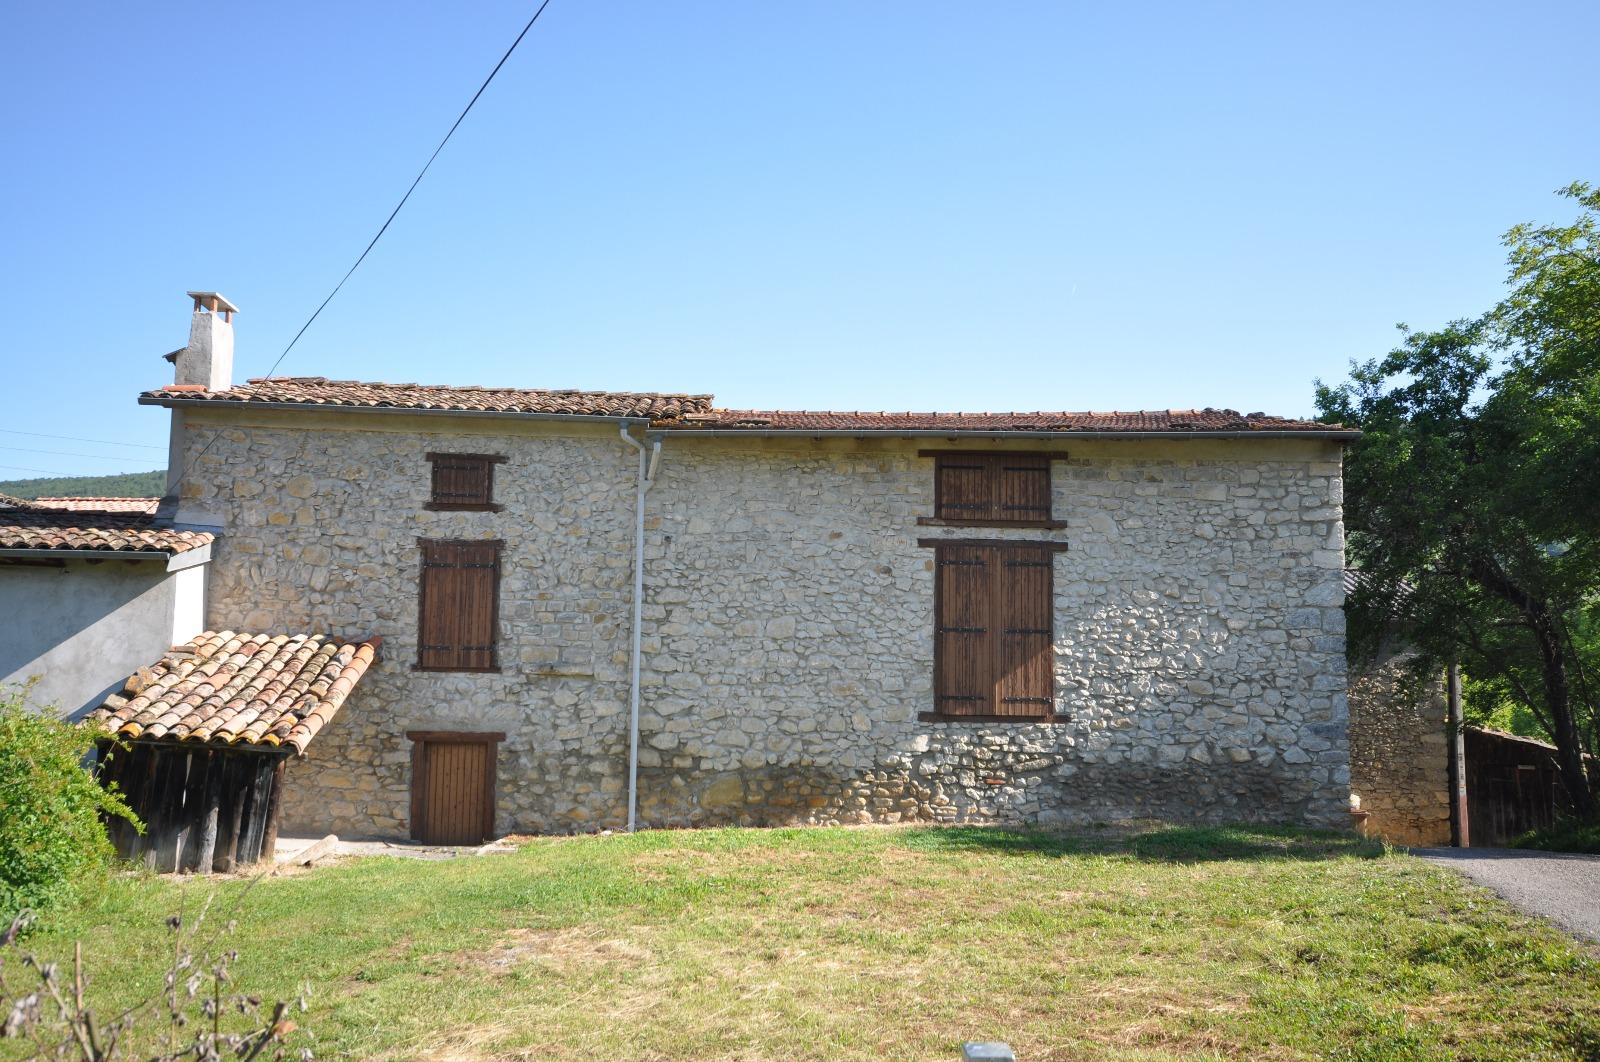 Belesta belle grange r habiliter avec un terrain de 2000m constructible - Rehabiliter une grange ...